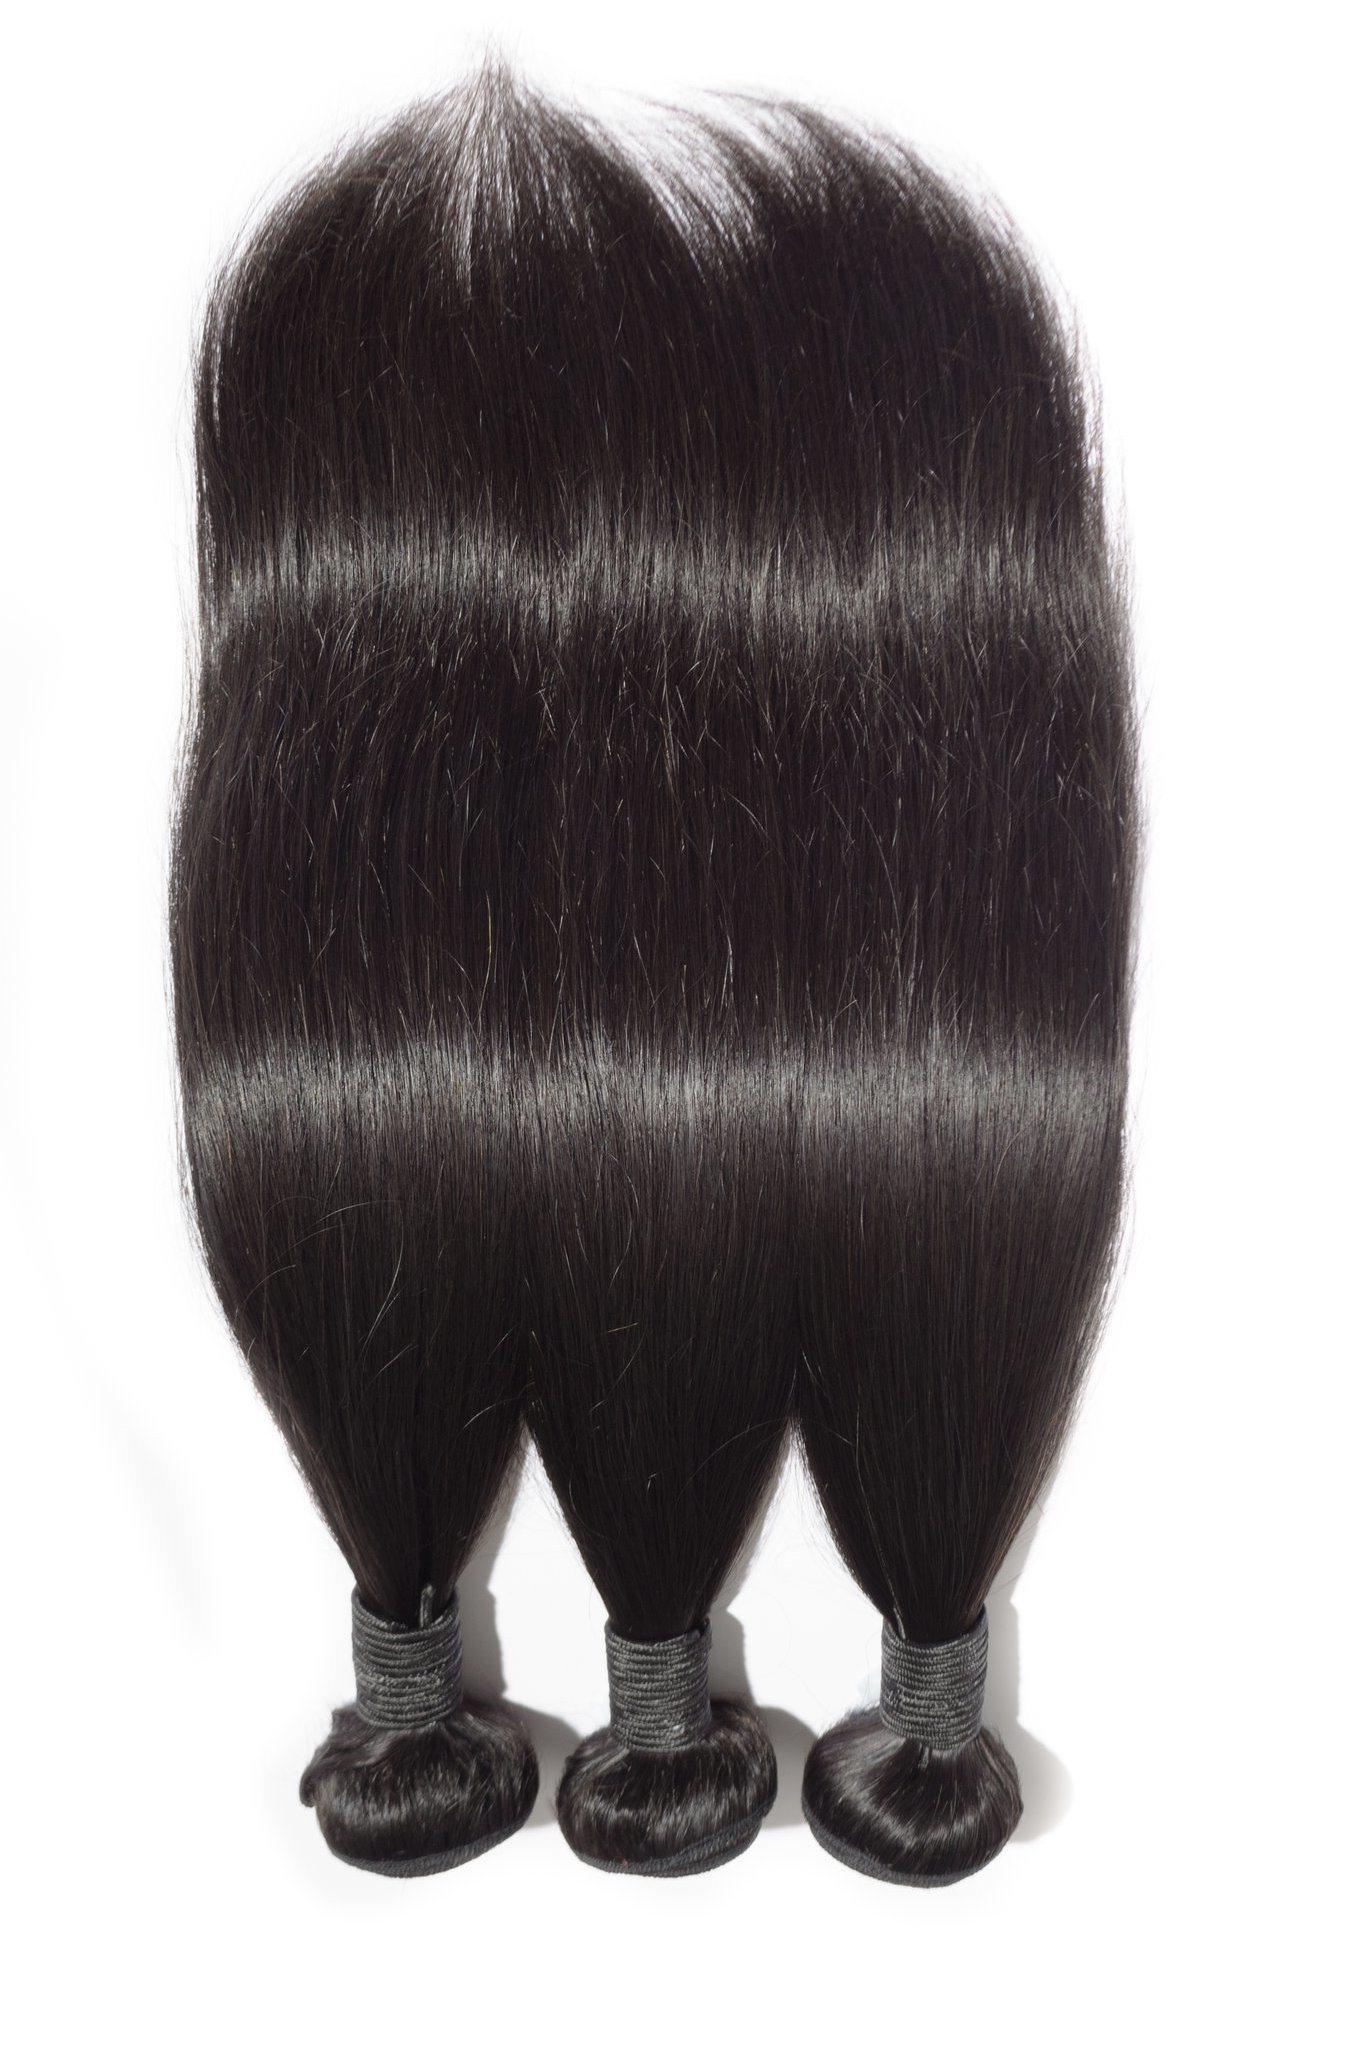 China 14 Medium Length Hair Weaves 100 Virgin Remy Human Hair Jet Black Silk Straight Wholesale Price China Hair Weaves And Hair Weaving Price